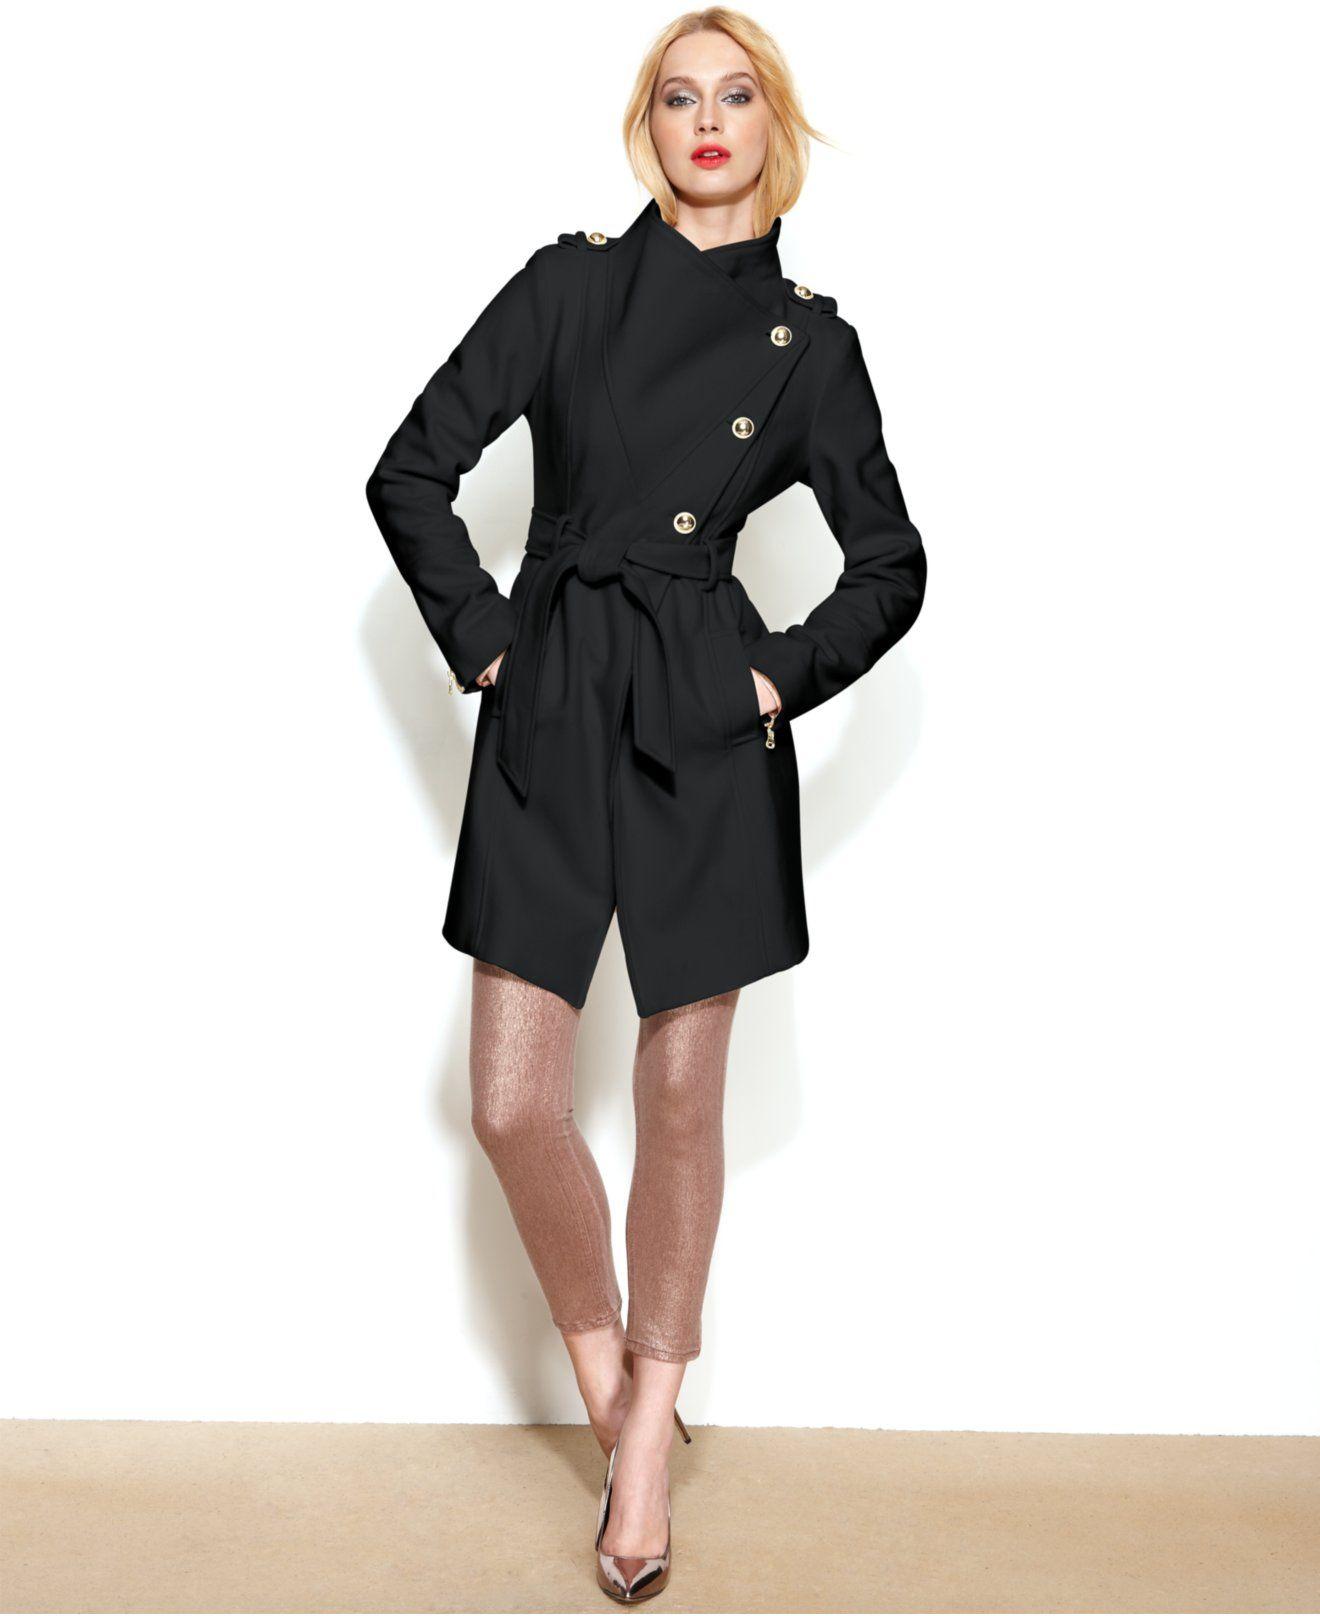 132afc9e8cf GUESS Asymmetrical Wool-Blend Belted Coat - Coats - Women - Macy s ...